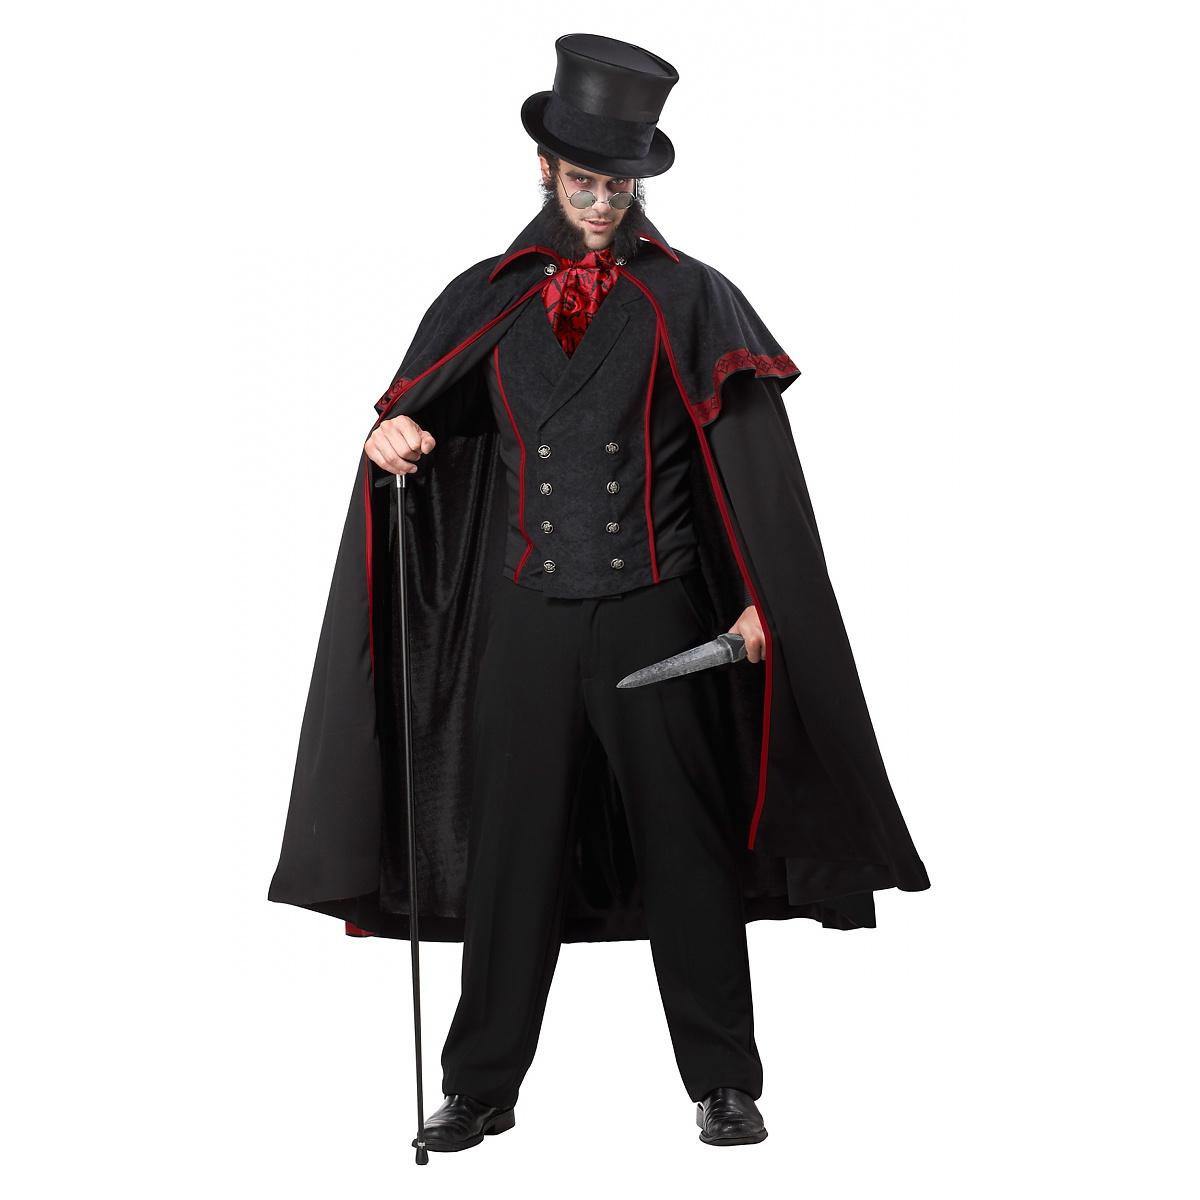 California Costume Jack the Ripper Adult Mens Victorian Vampire Halloween Costume at Sears.com